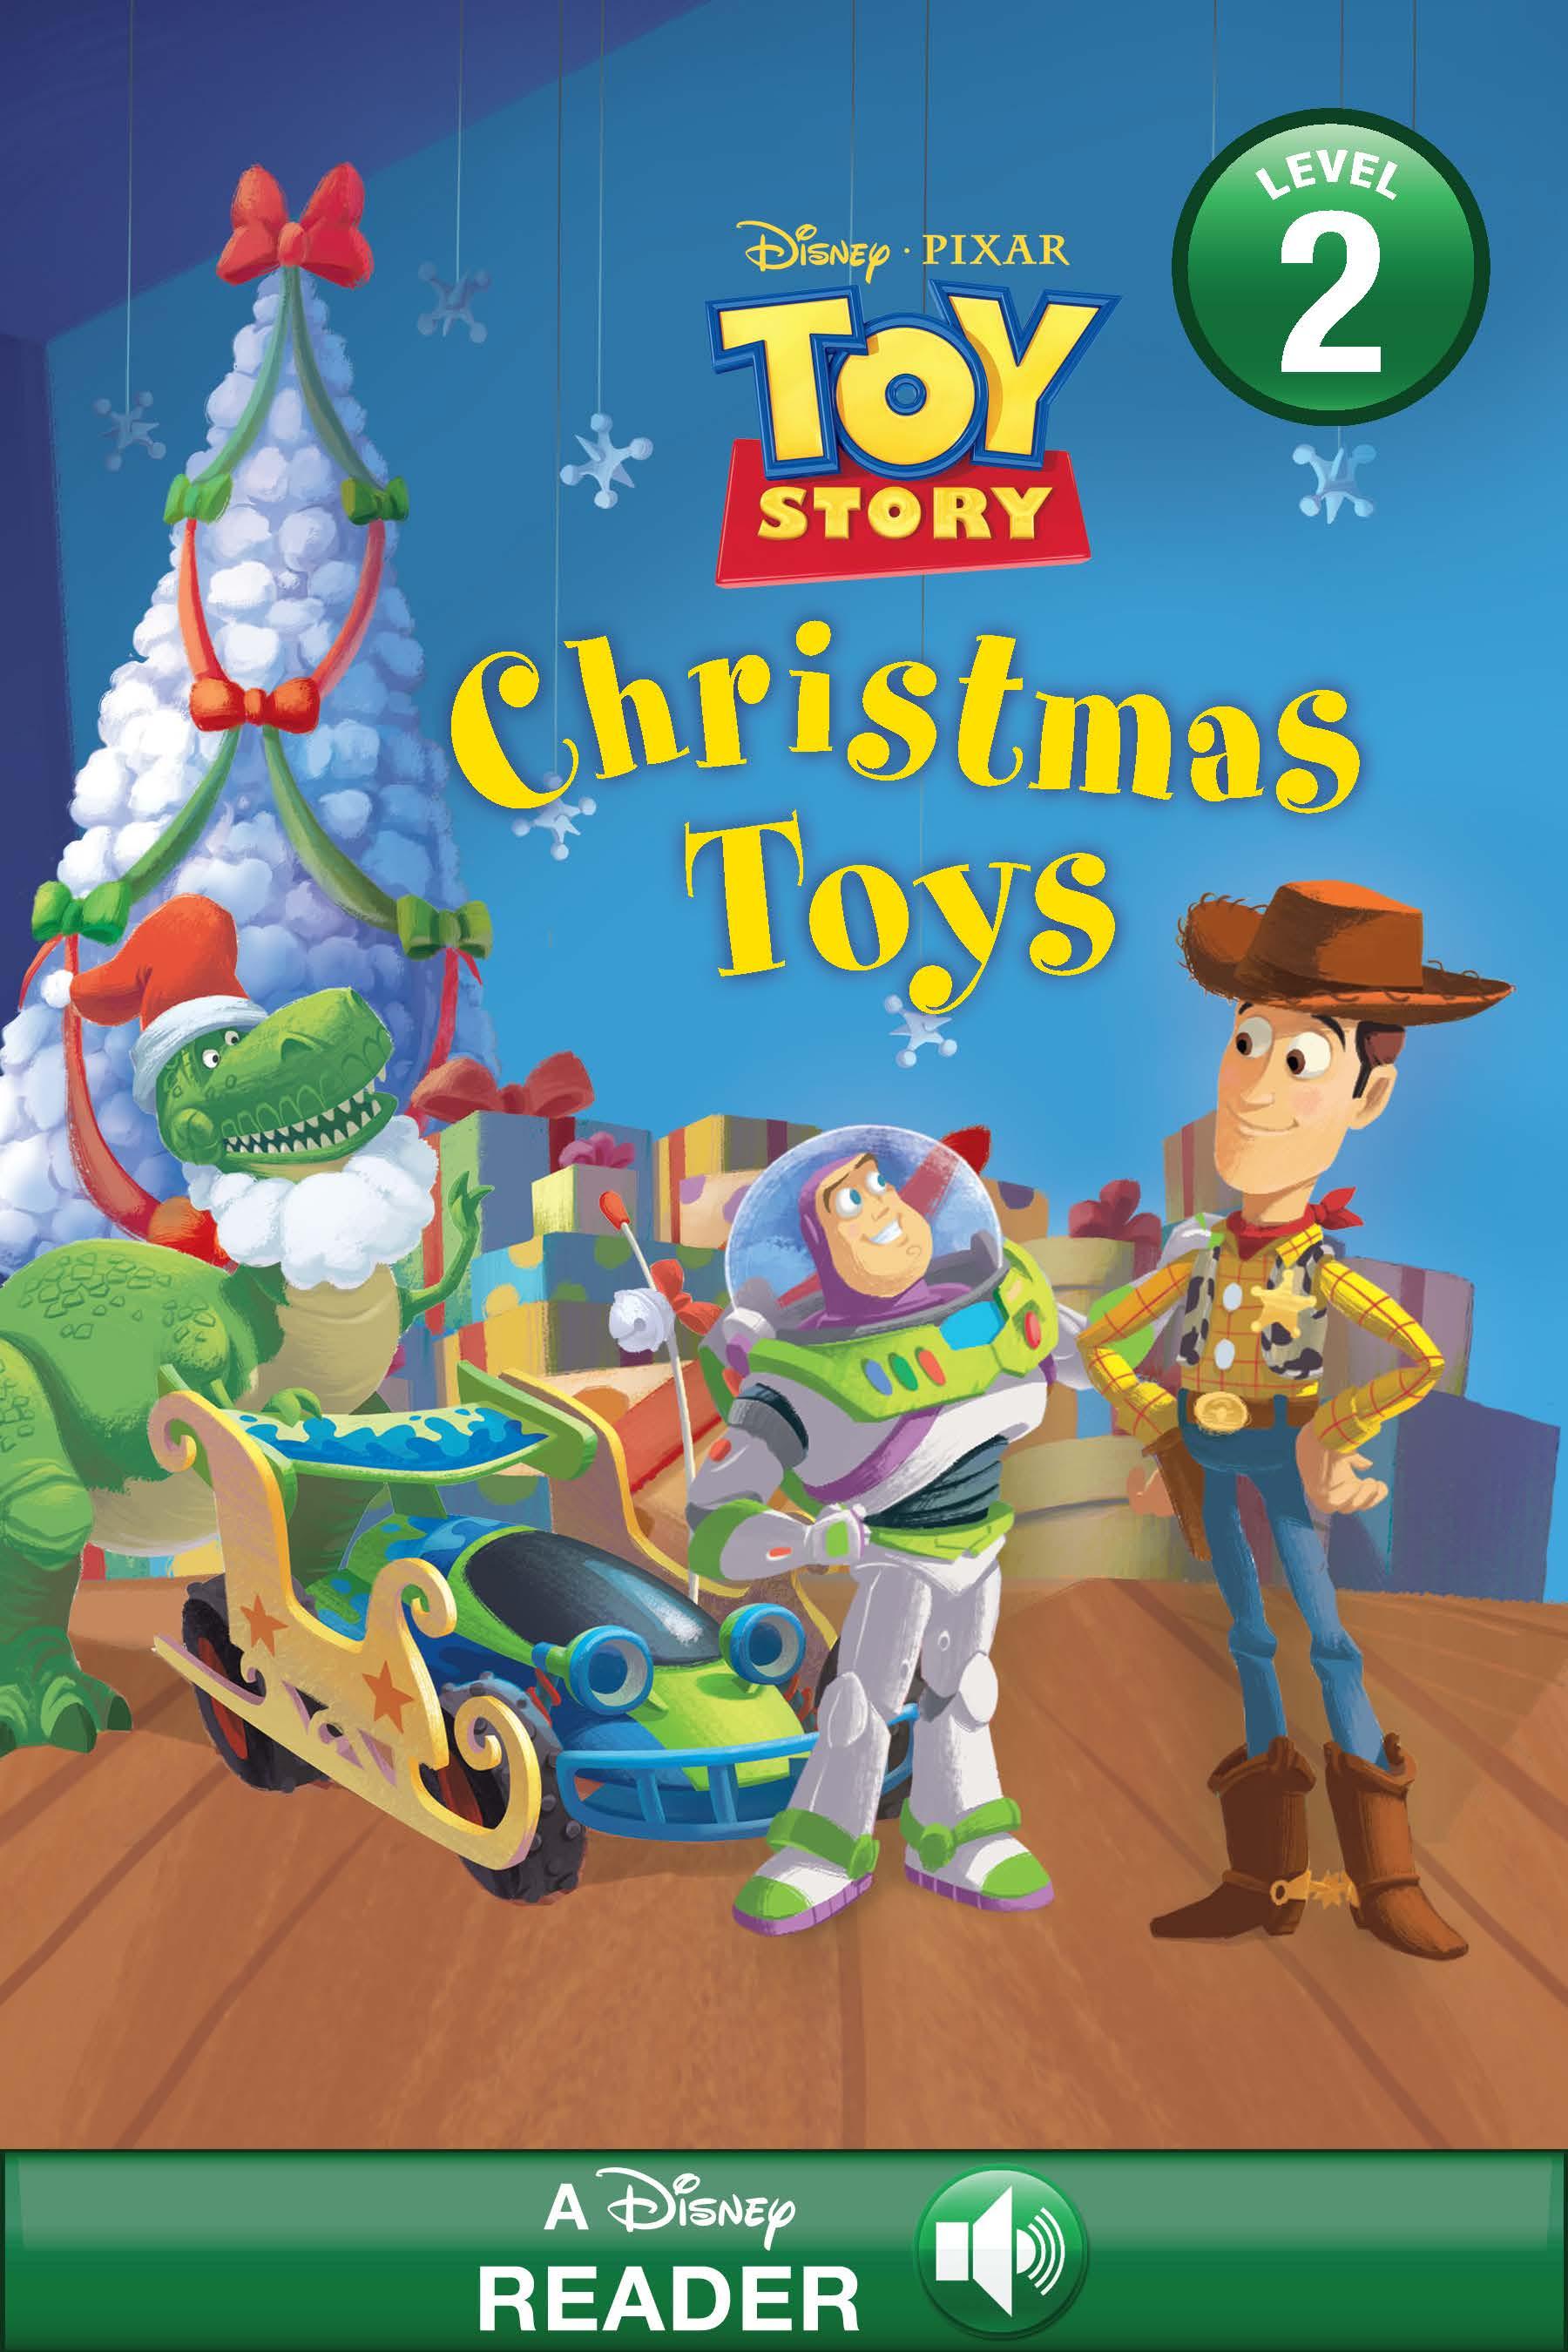 Disney*Pixar Toy Story: Christmas Toys